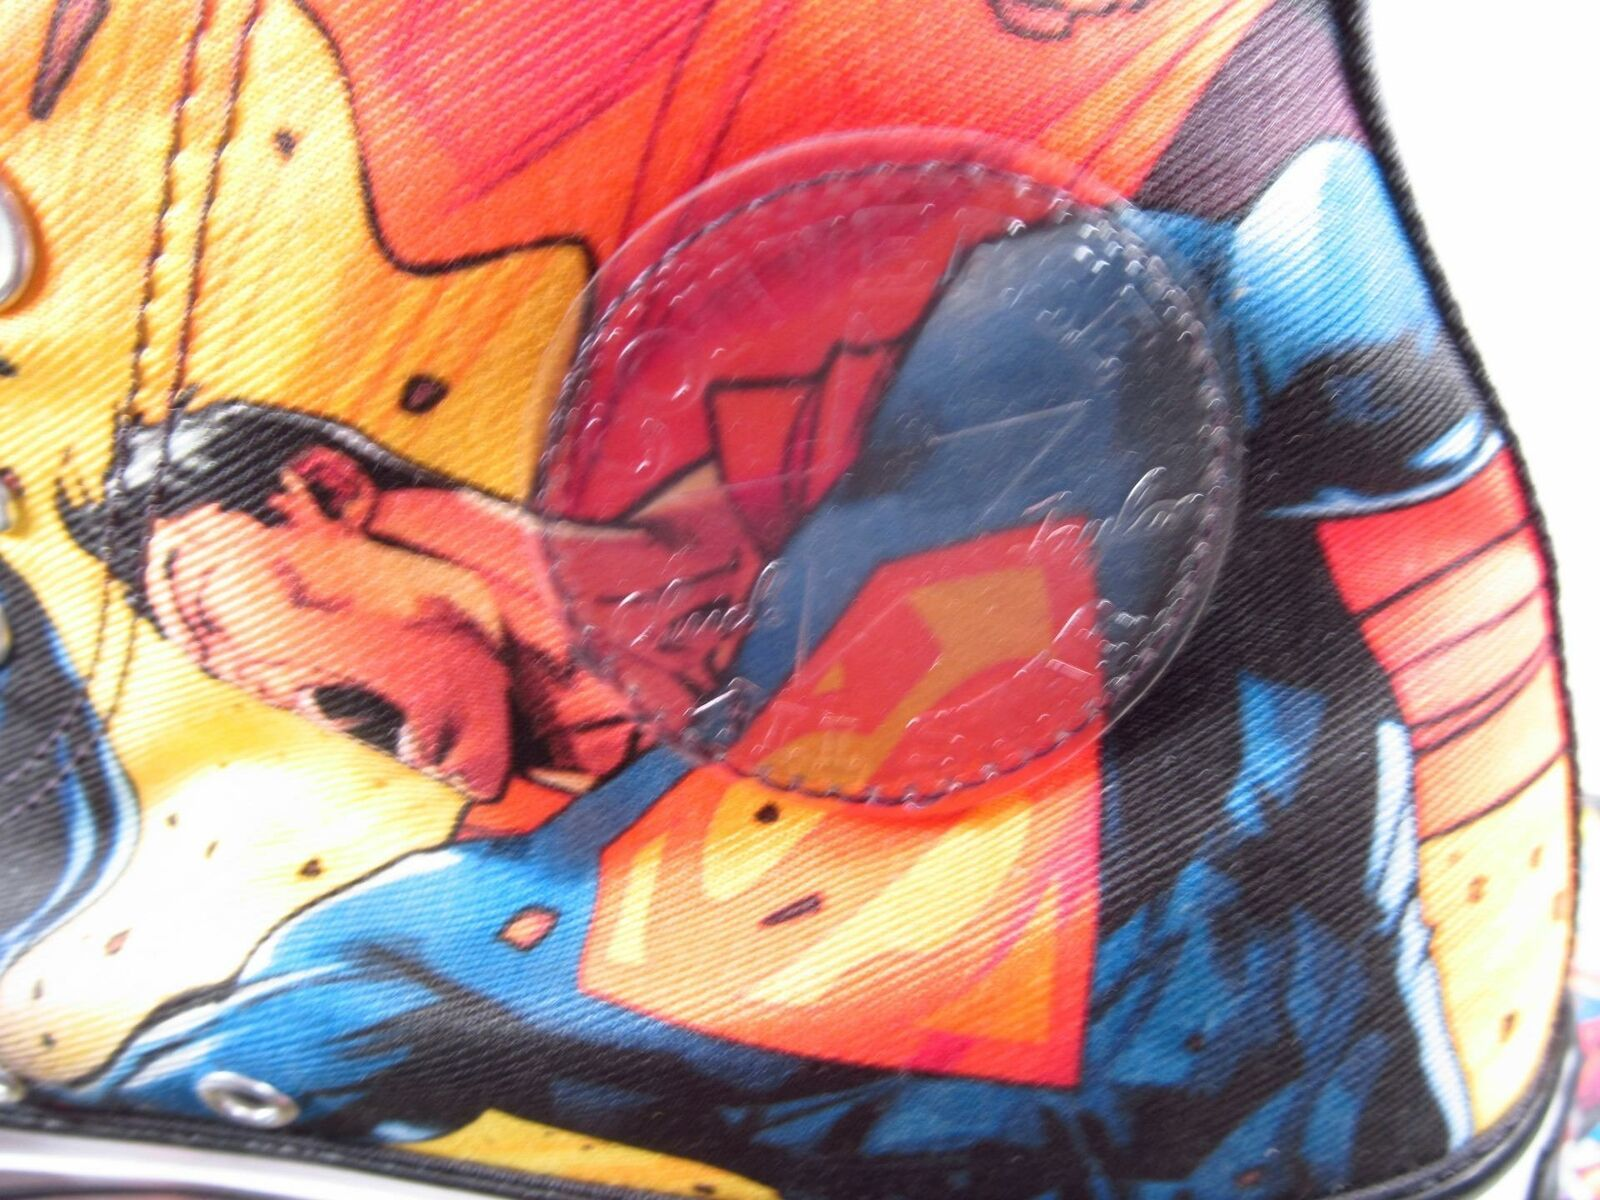 Converse x DC Comics Rebirth Superman Volume 1 Chuck Taylor All Star Hi 161389C